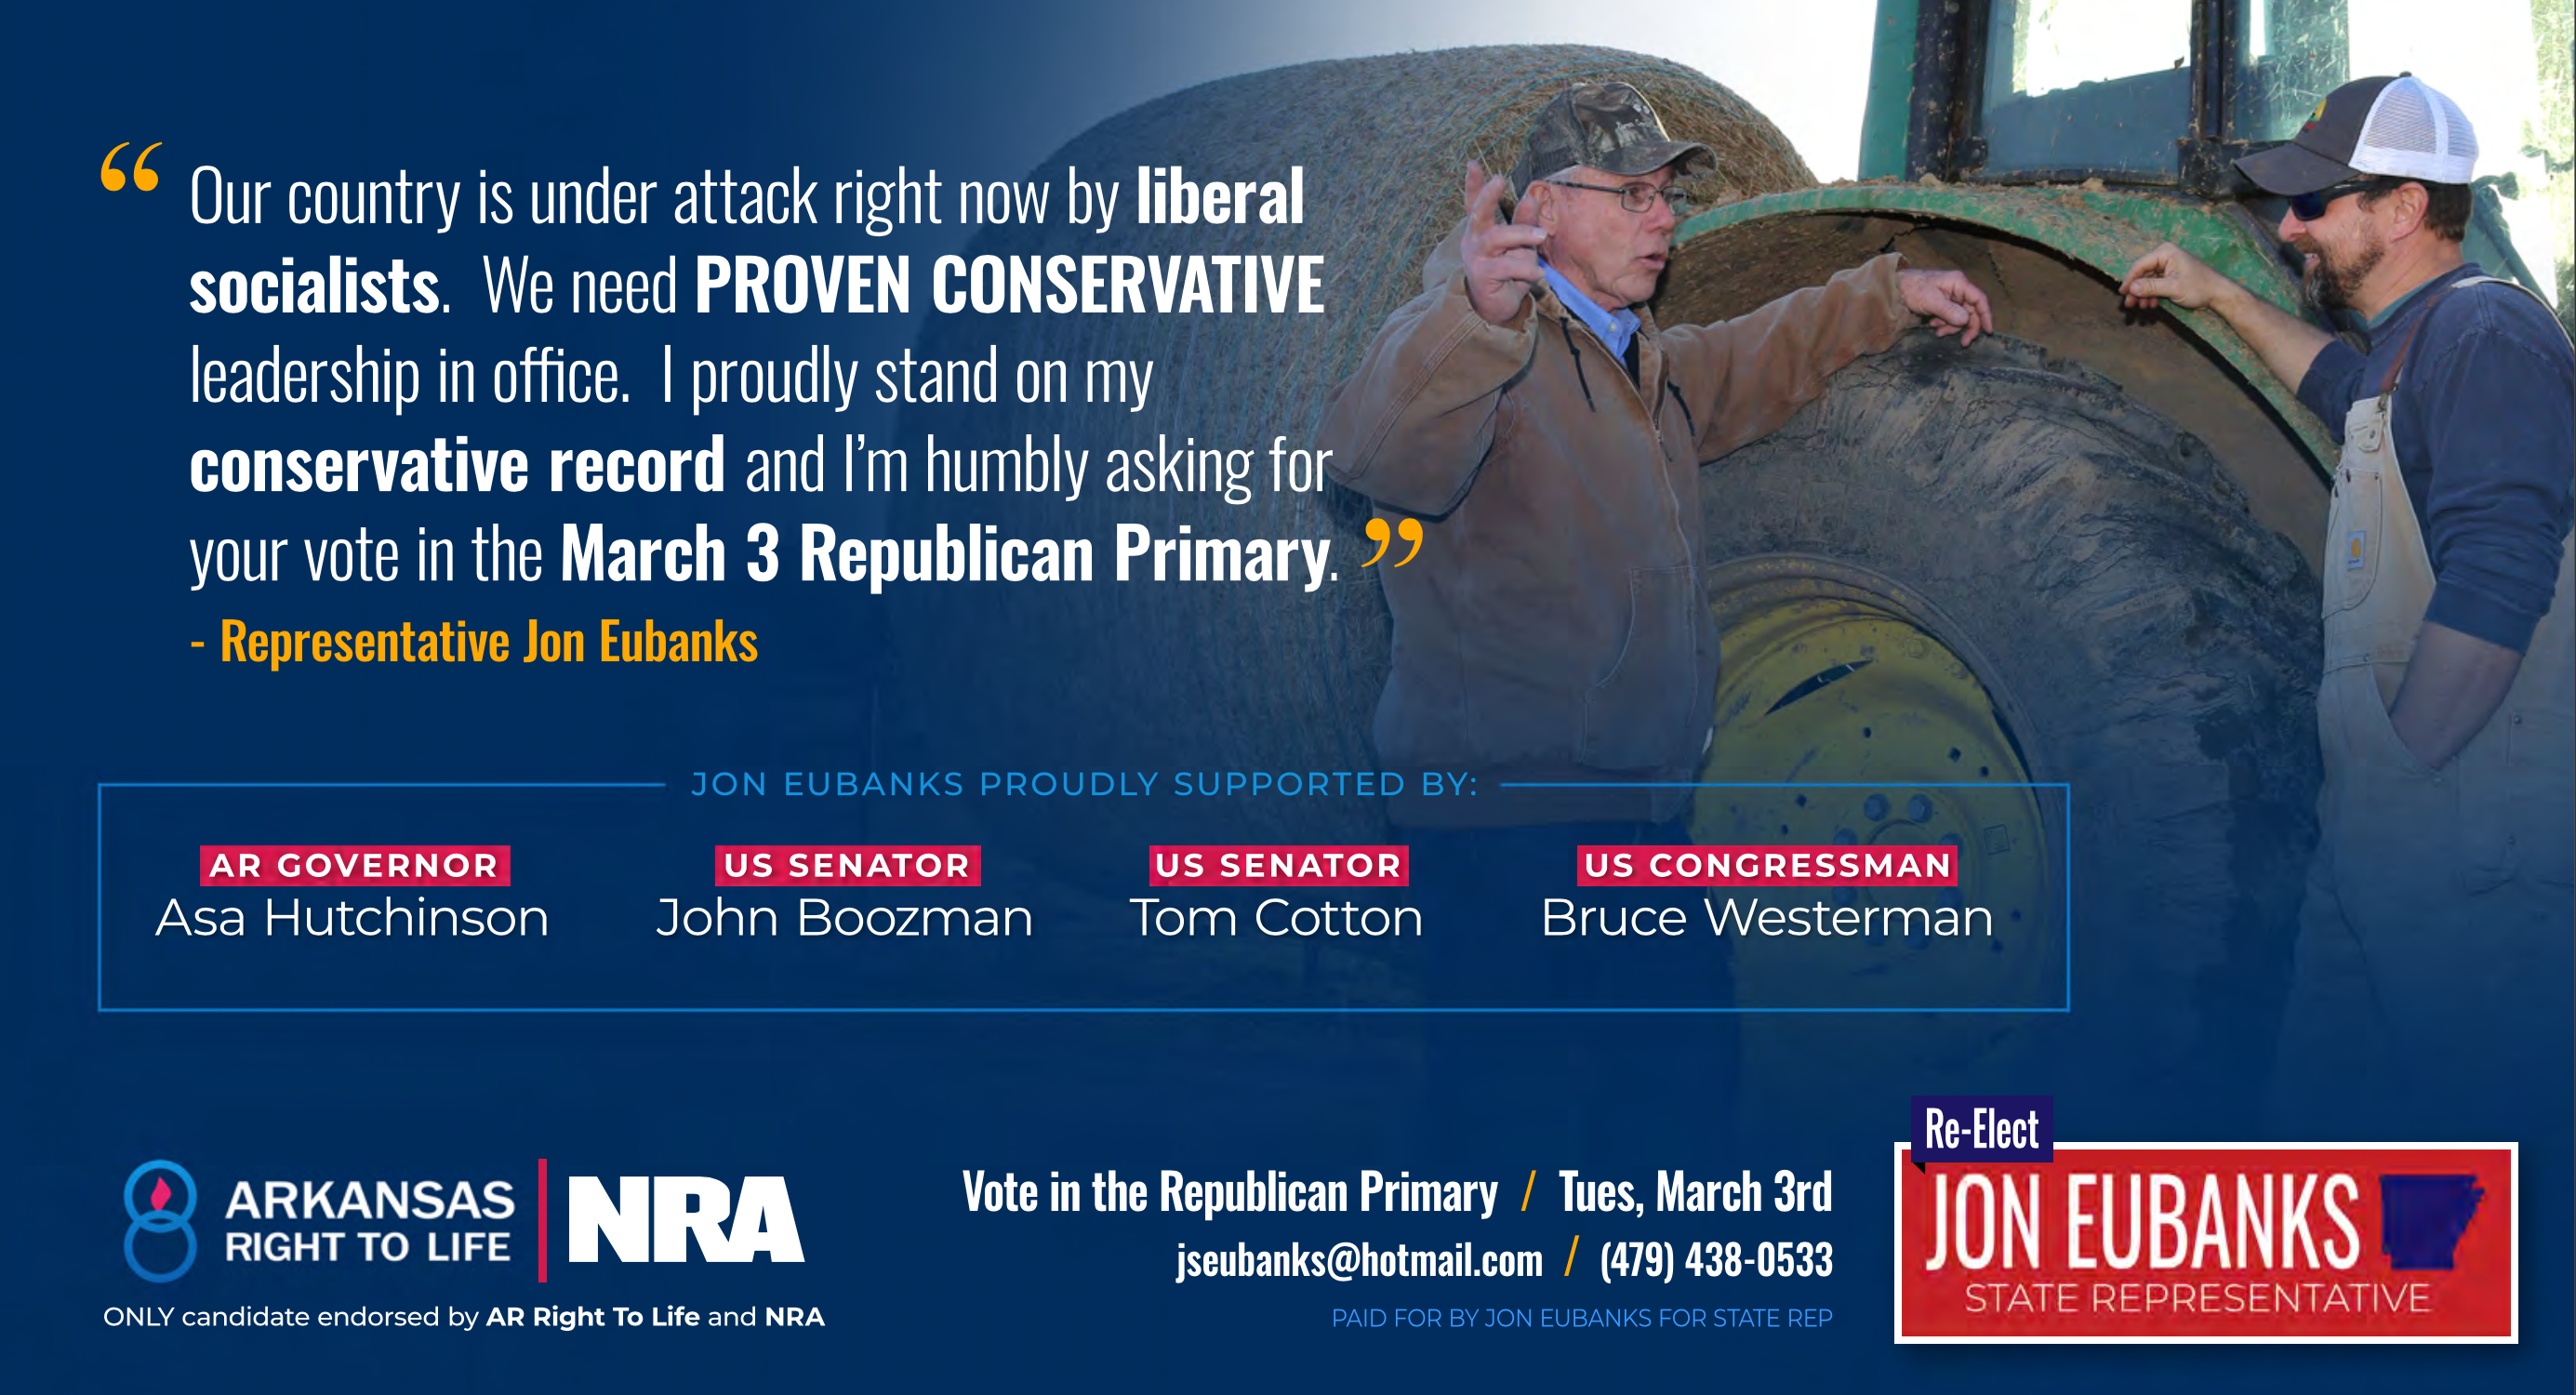 Endorsements - Re-Elect State Rep. Jon Eubanks